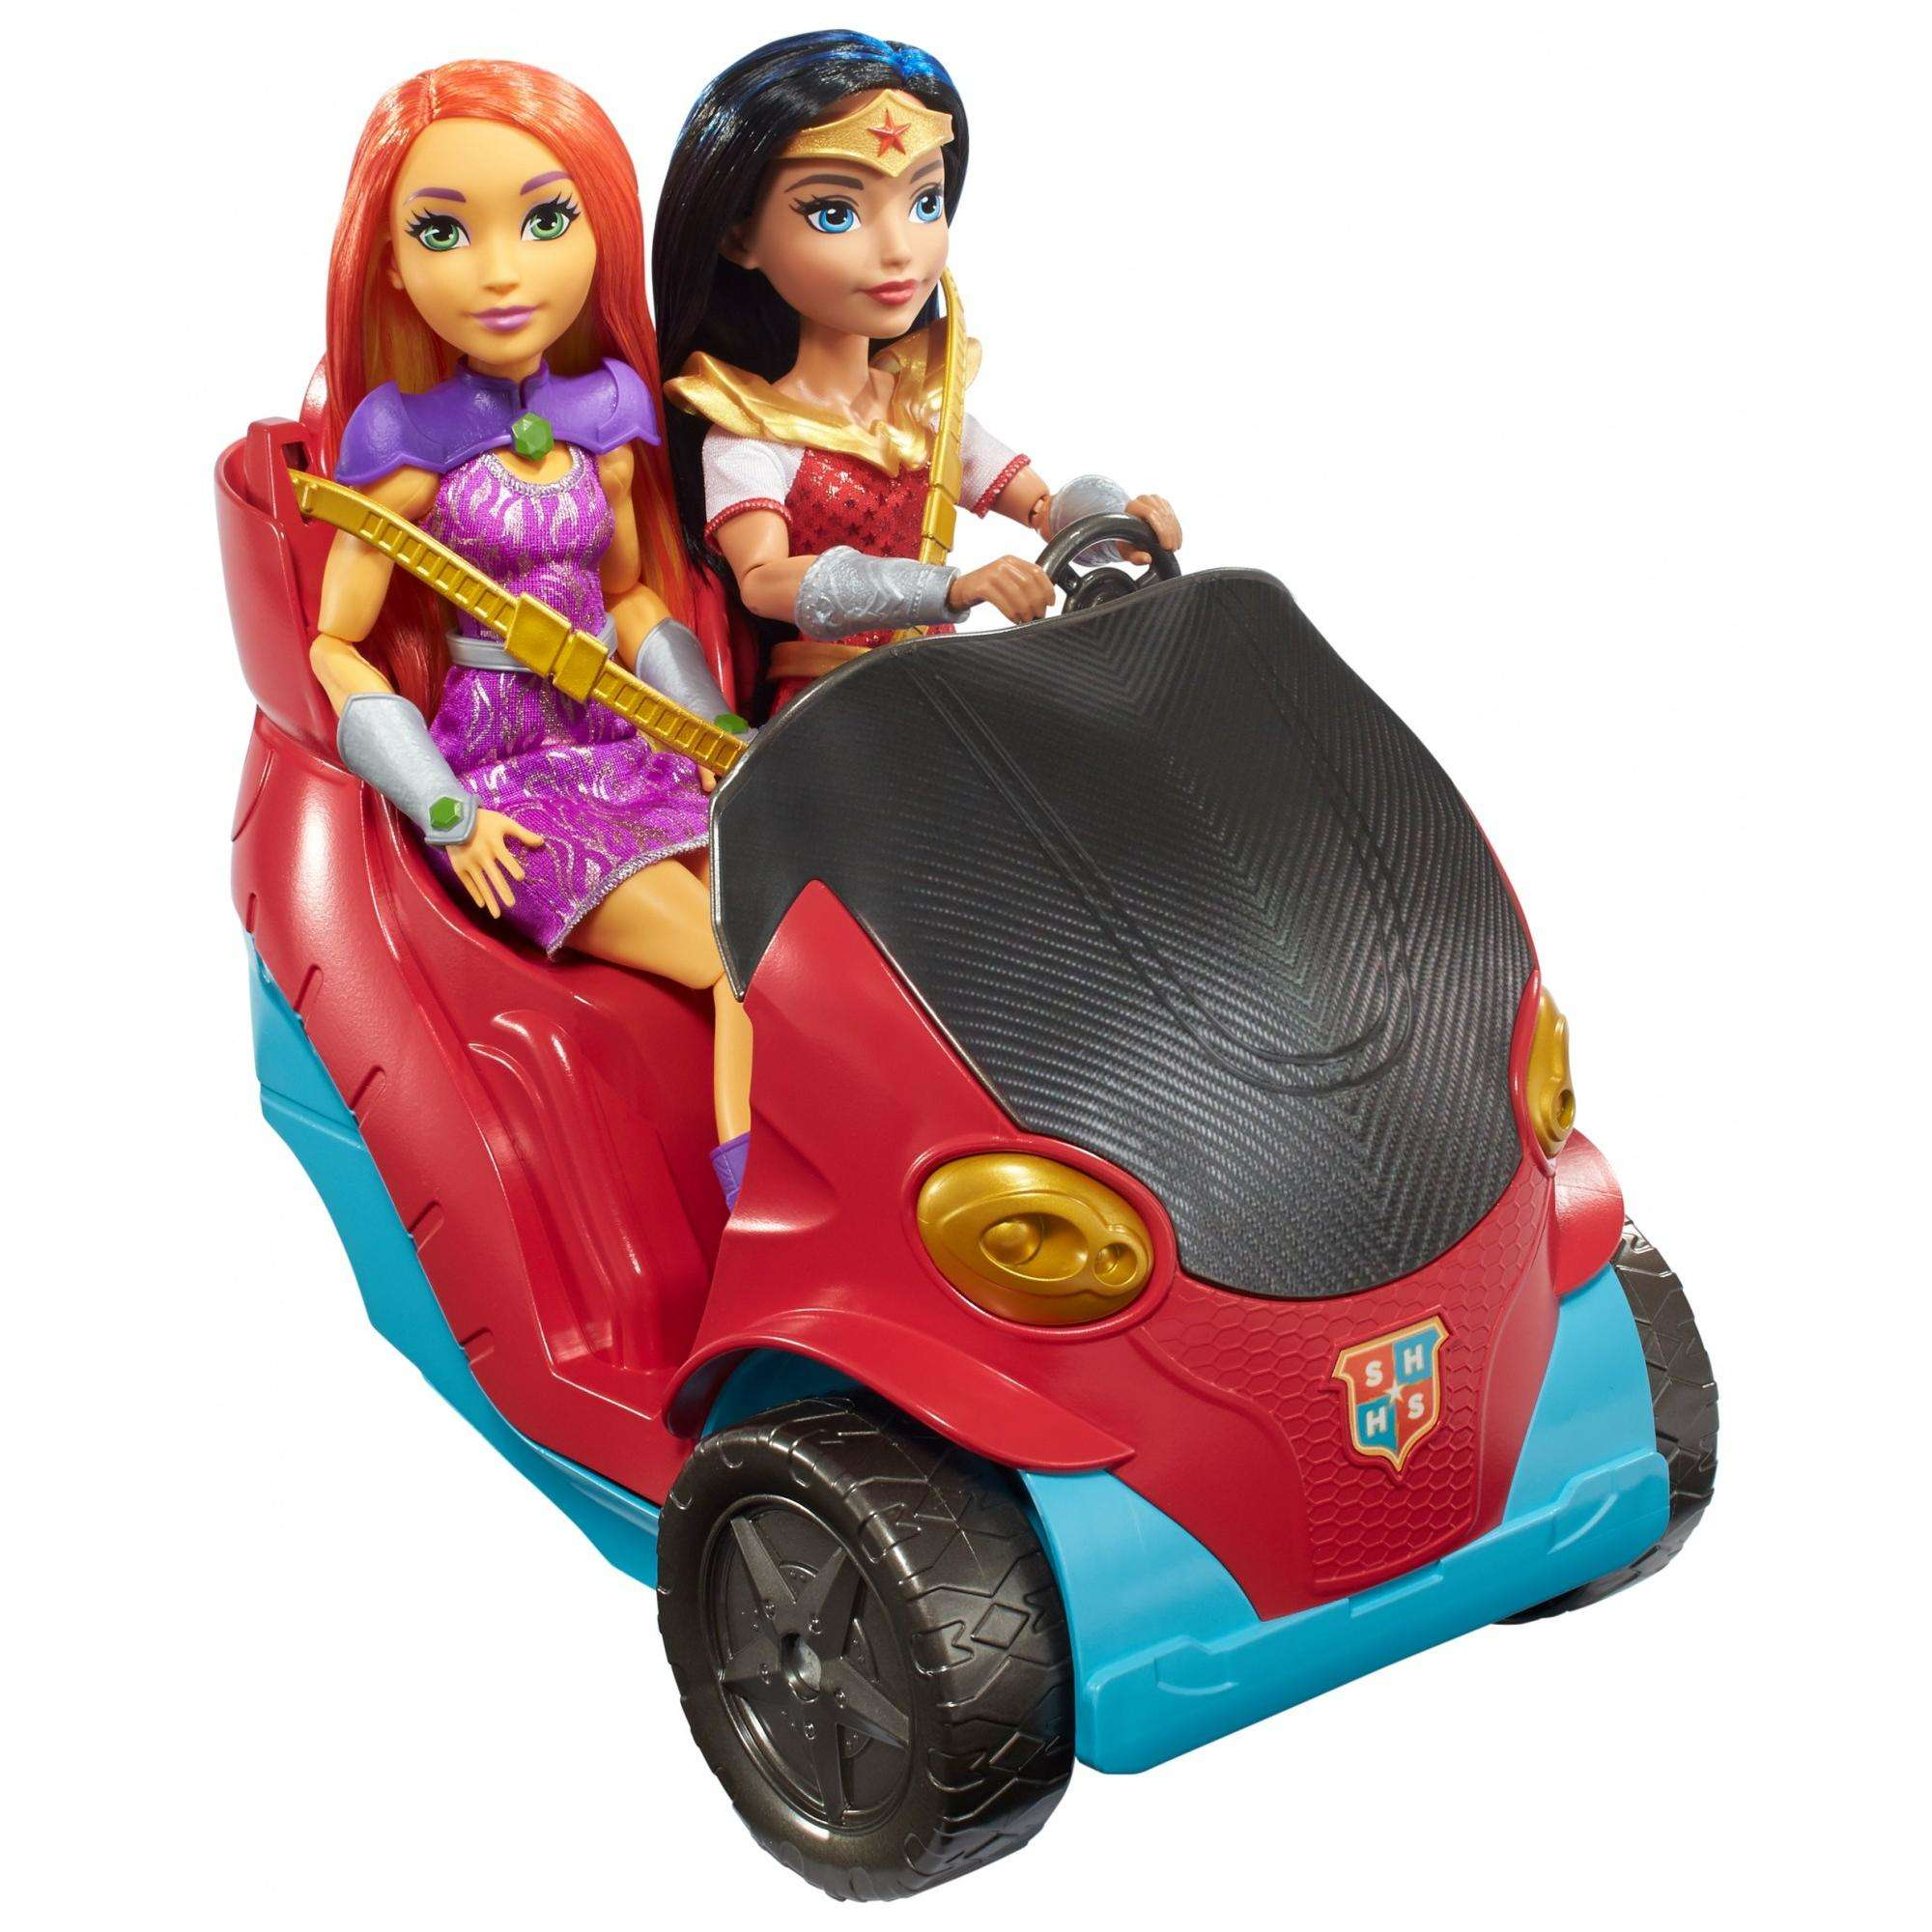 DC Super Hero Girls Bus Vehicle - Walmart.com on